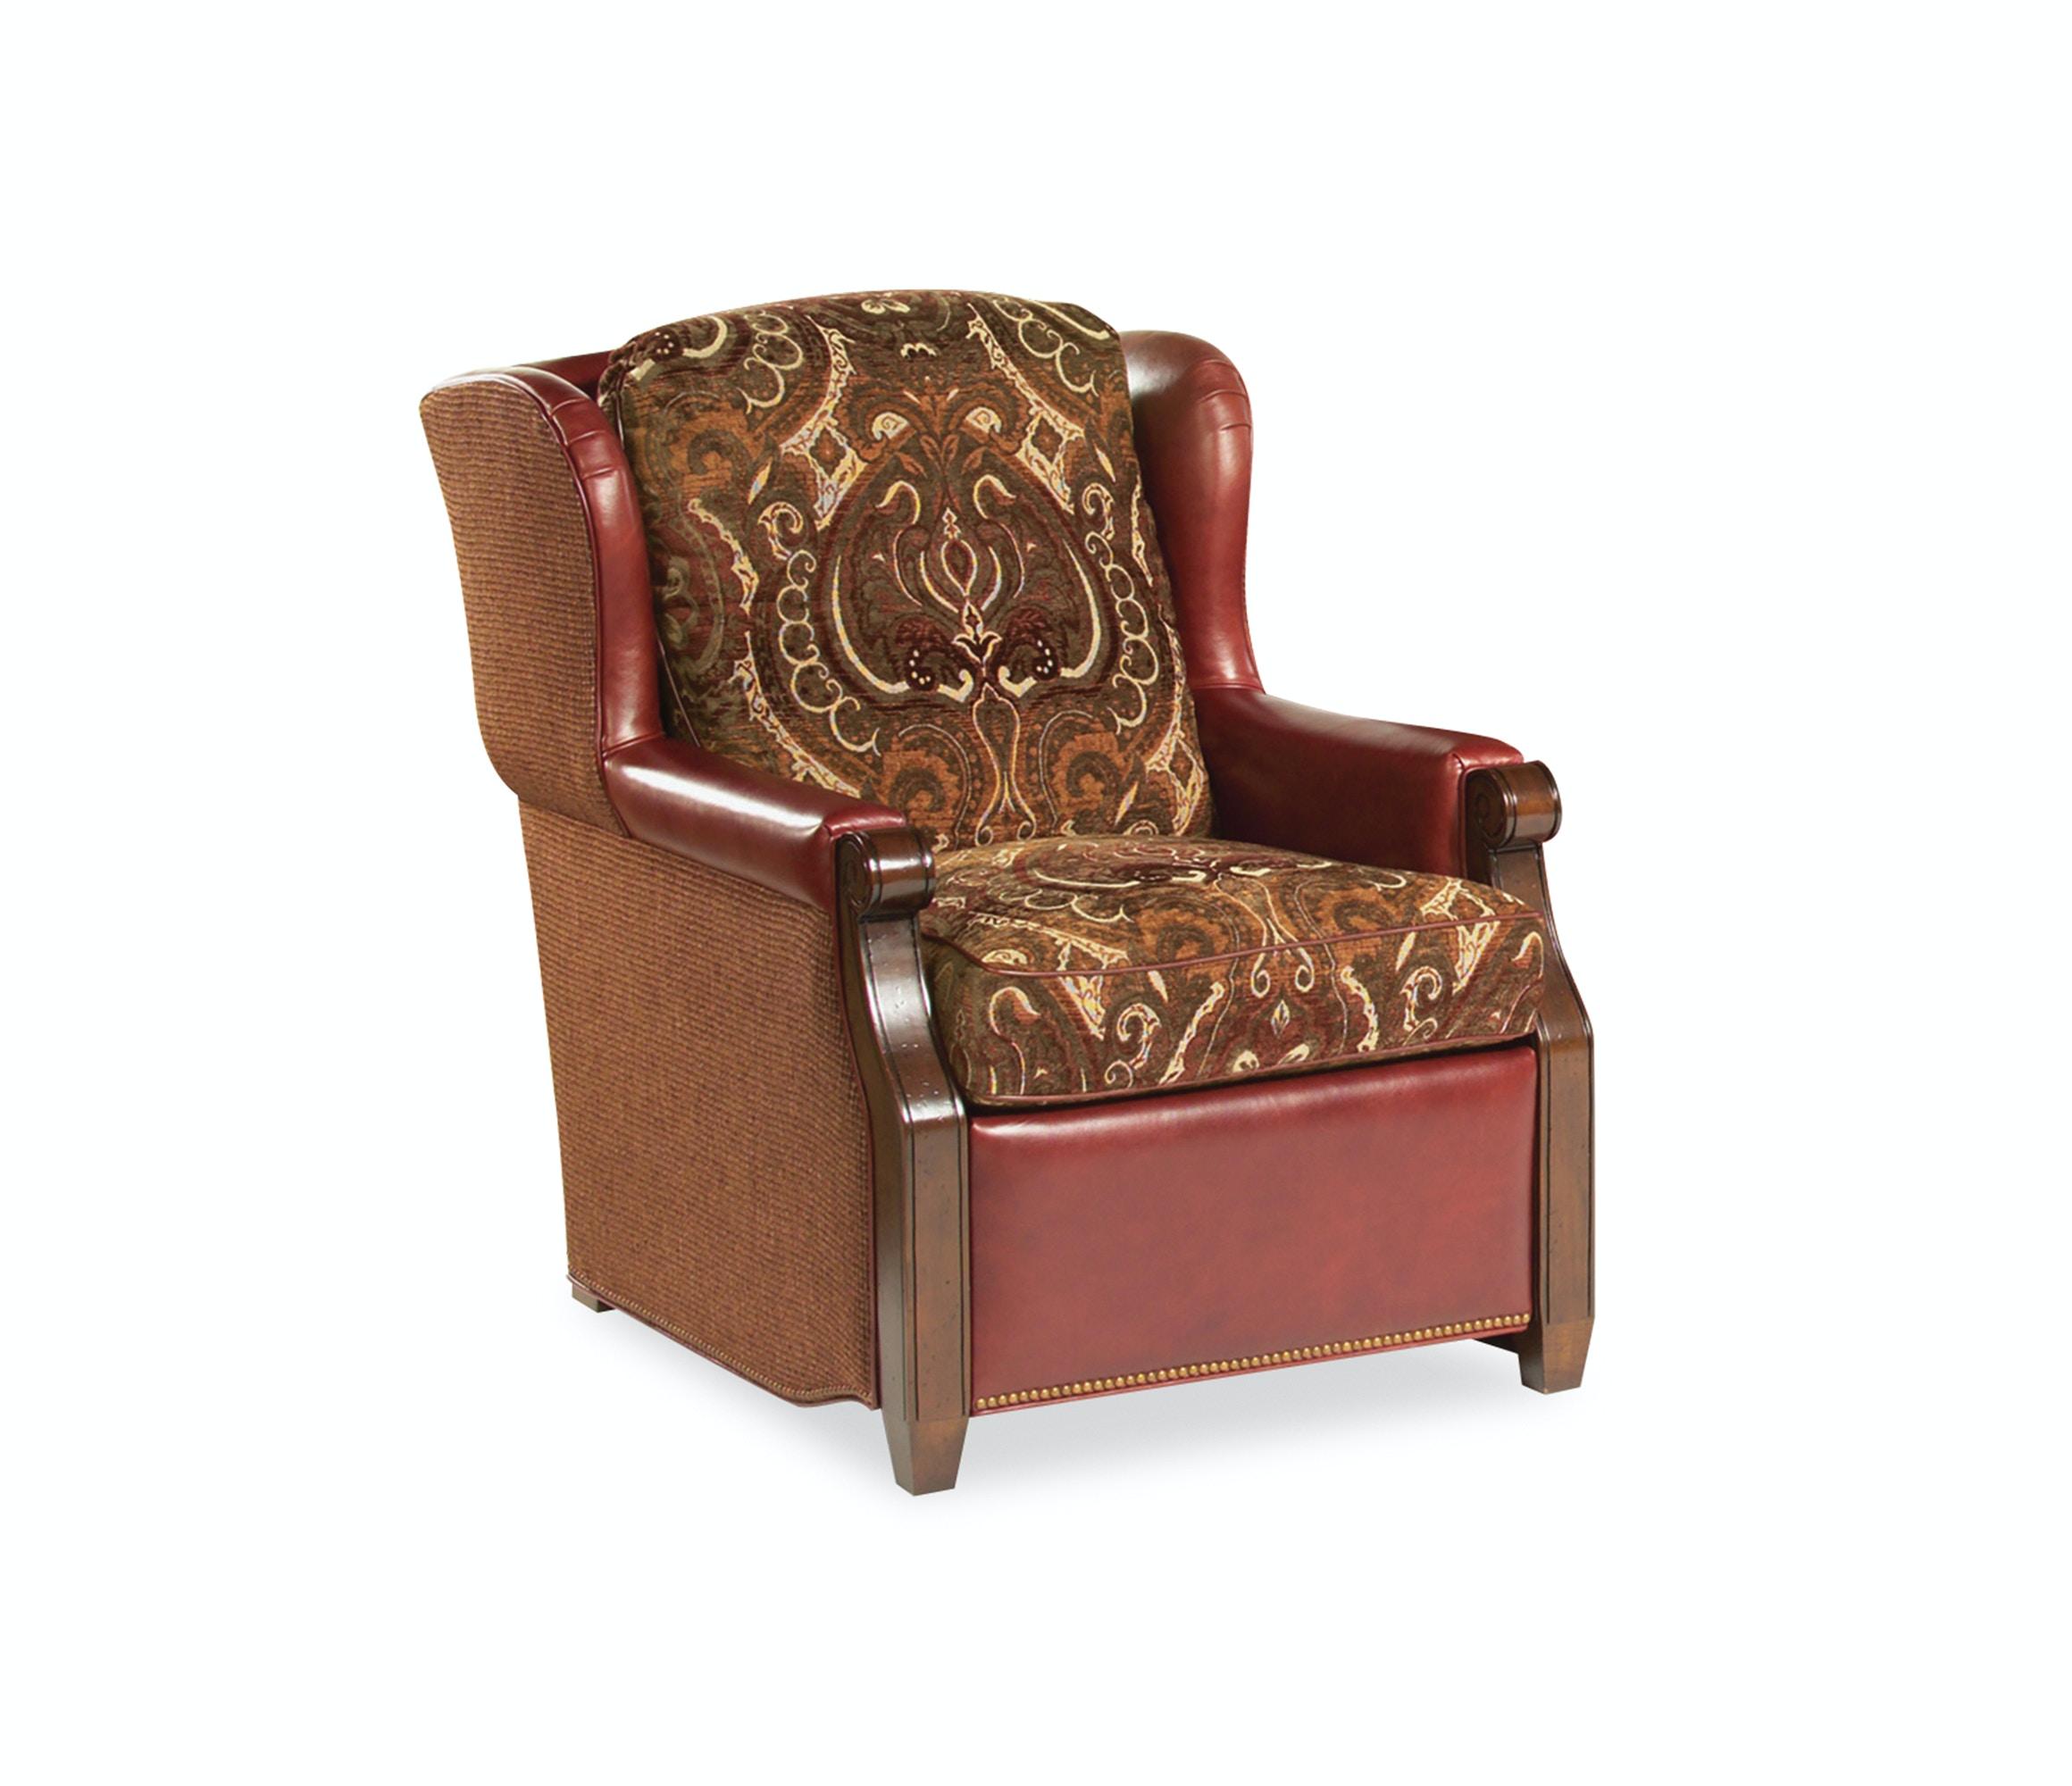 Taylor King Furniture RECLINING CHAIR FL867 01Zm